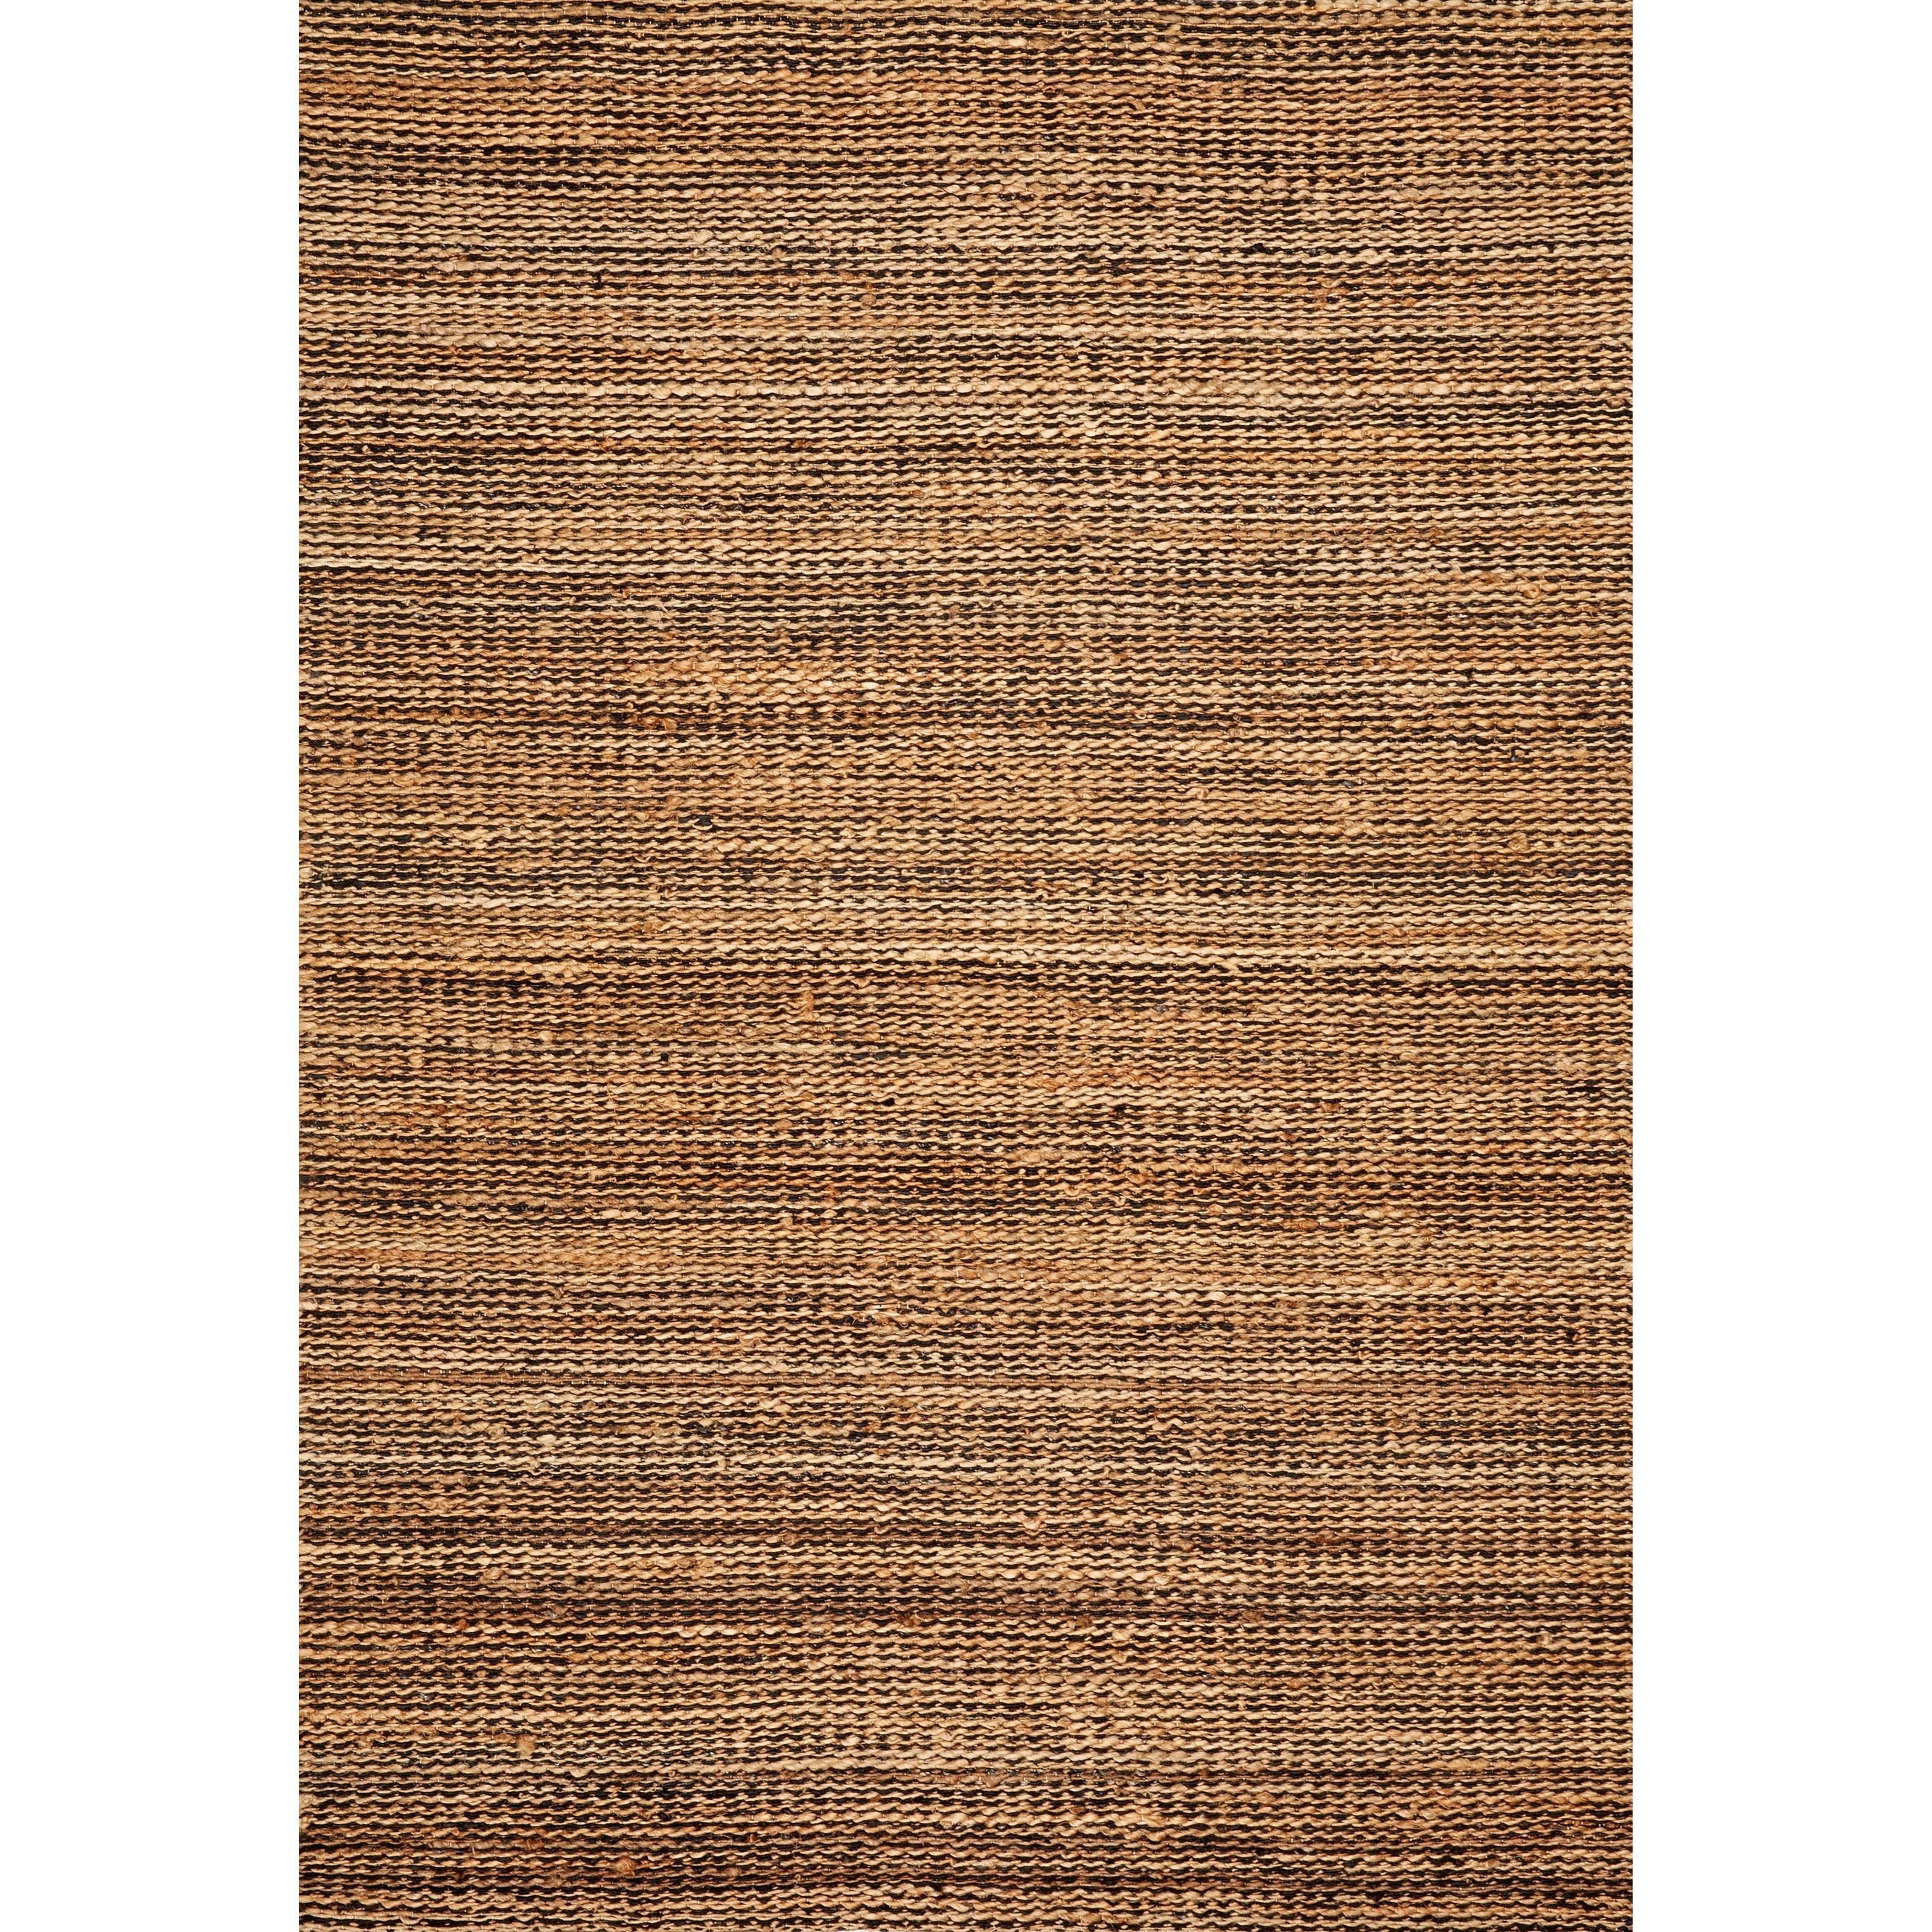 Banyan Midnight 8'X10' Rug by Dalyn at Sadler's Home Furnishings